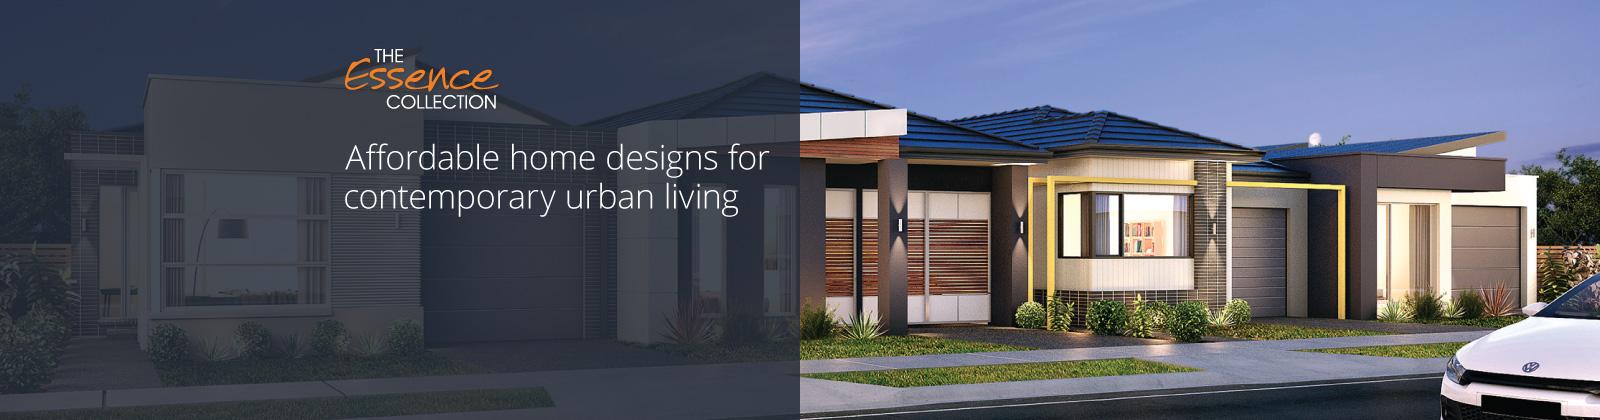 Devine homes house plans house design plans for Devine home designs